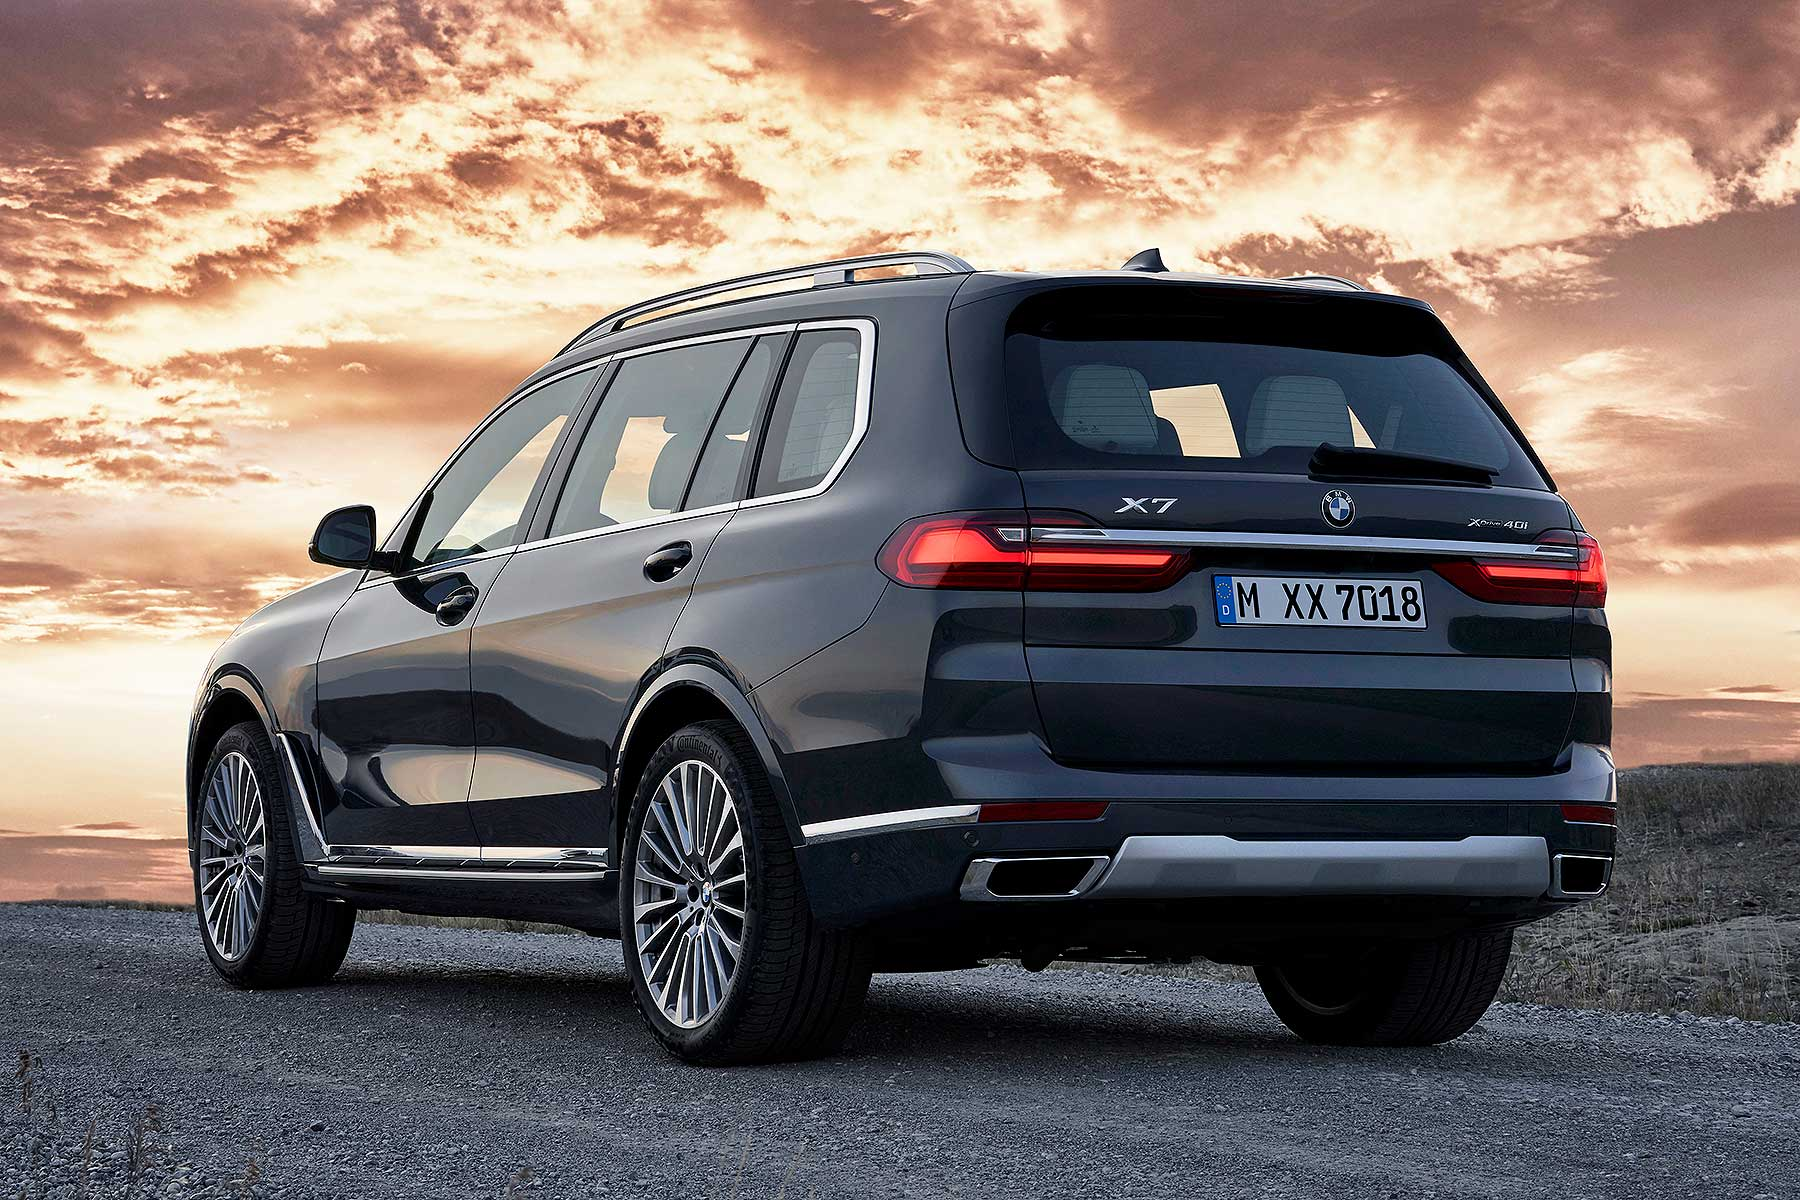 2019 BMW X7 luxury SUV | Motoring Research